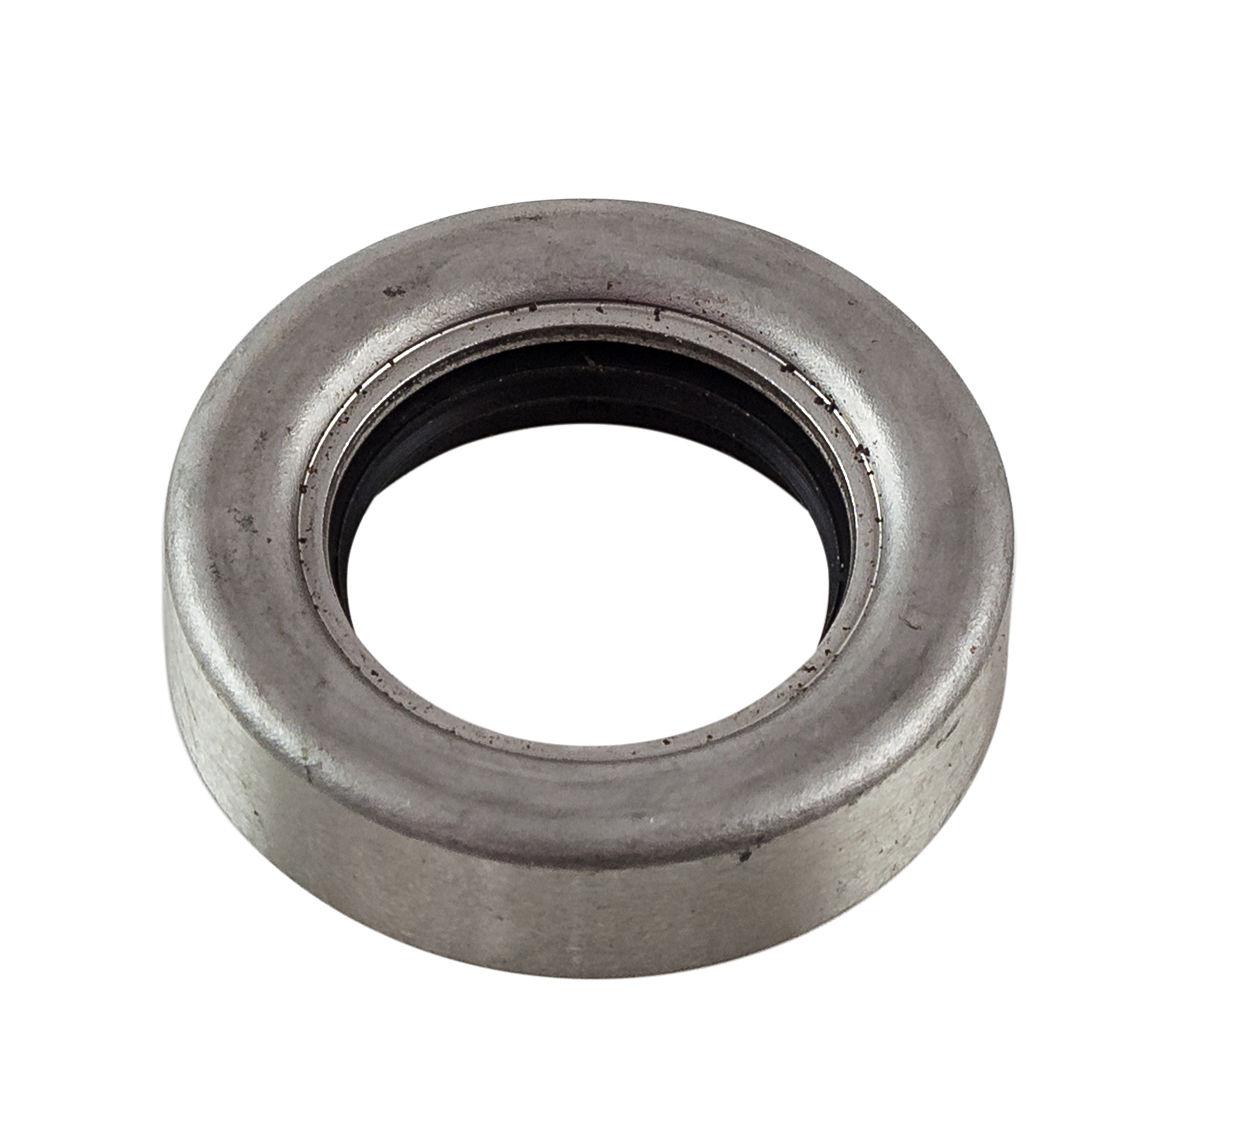 Shaft Oil Seal Mercury 6-15, OMAX Supplier